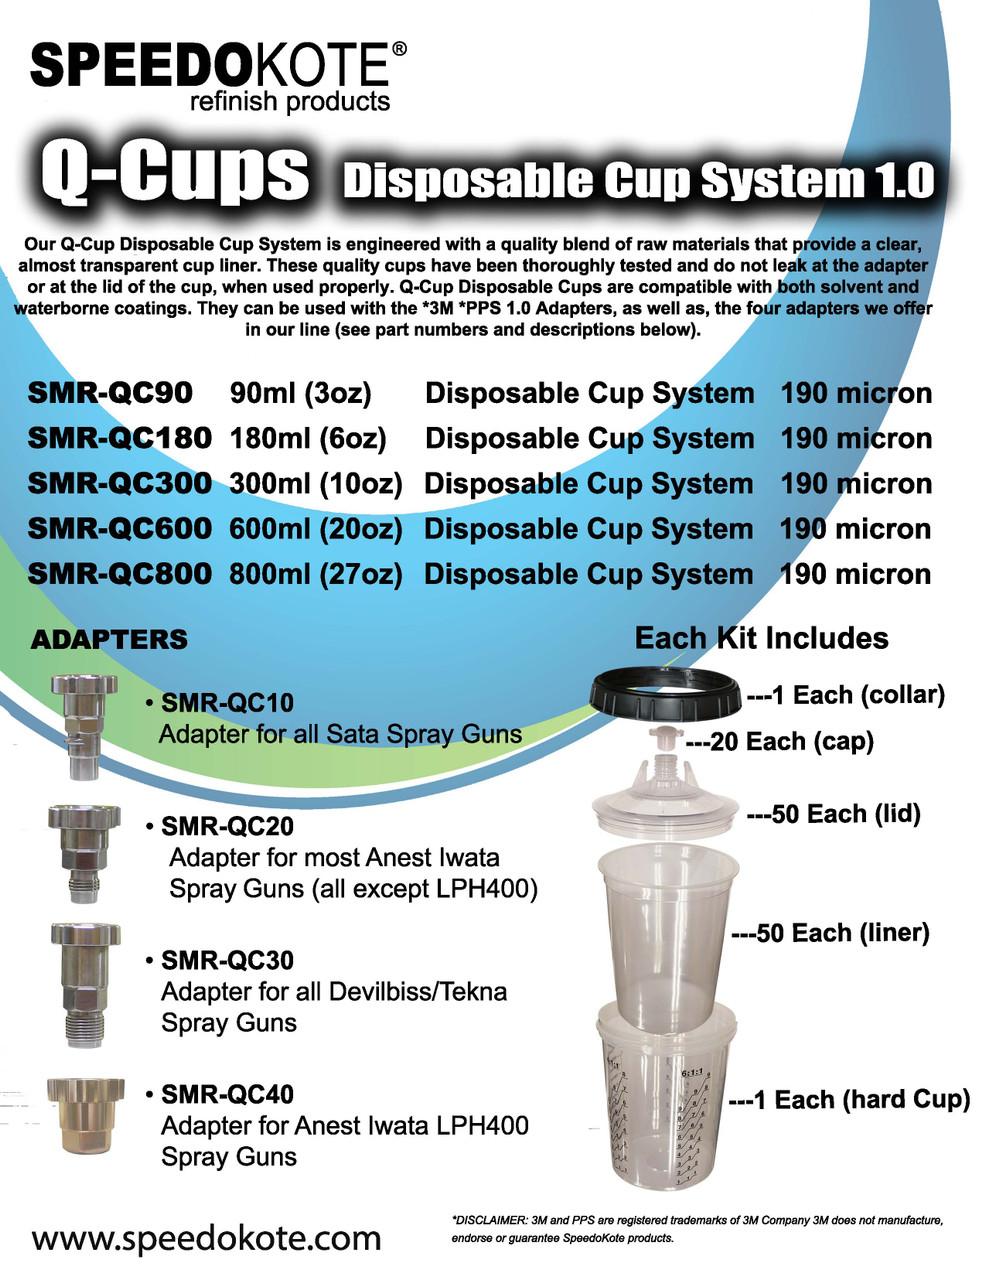 Q-Cup Spray Gun Cup Adapter SMR-QC20 - Fits Iwata Spray Guns (all except LPH400)